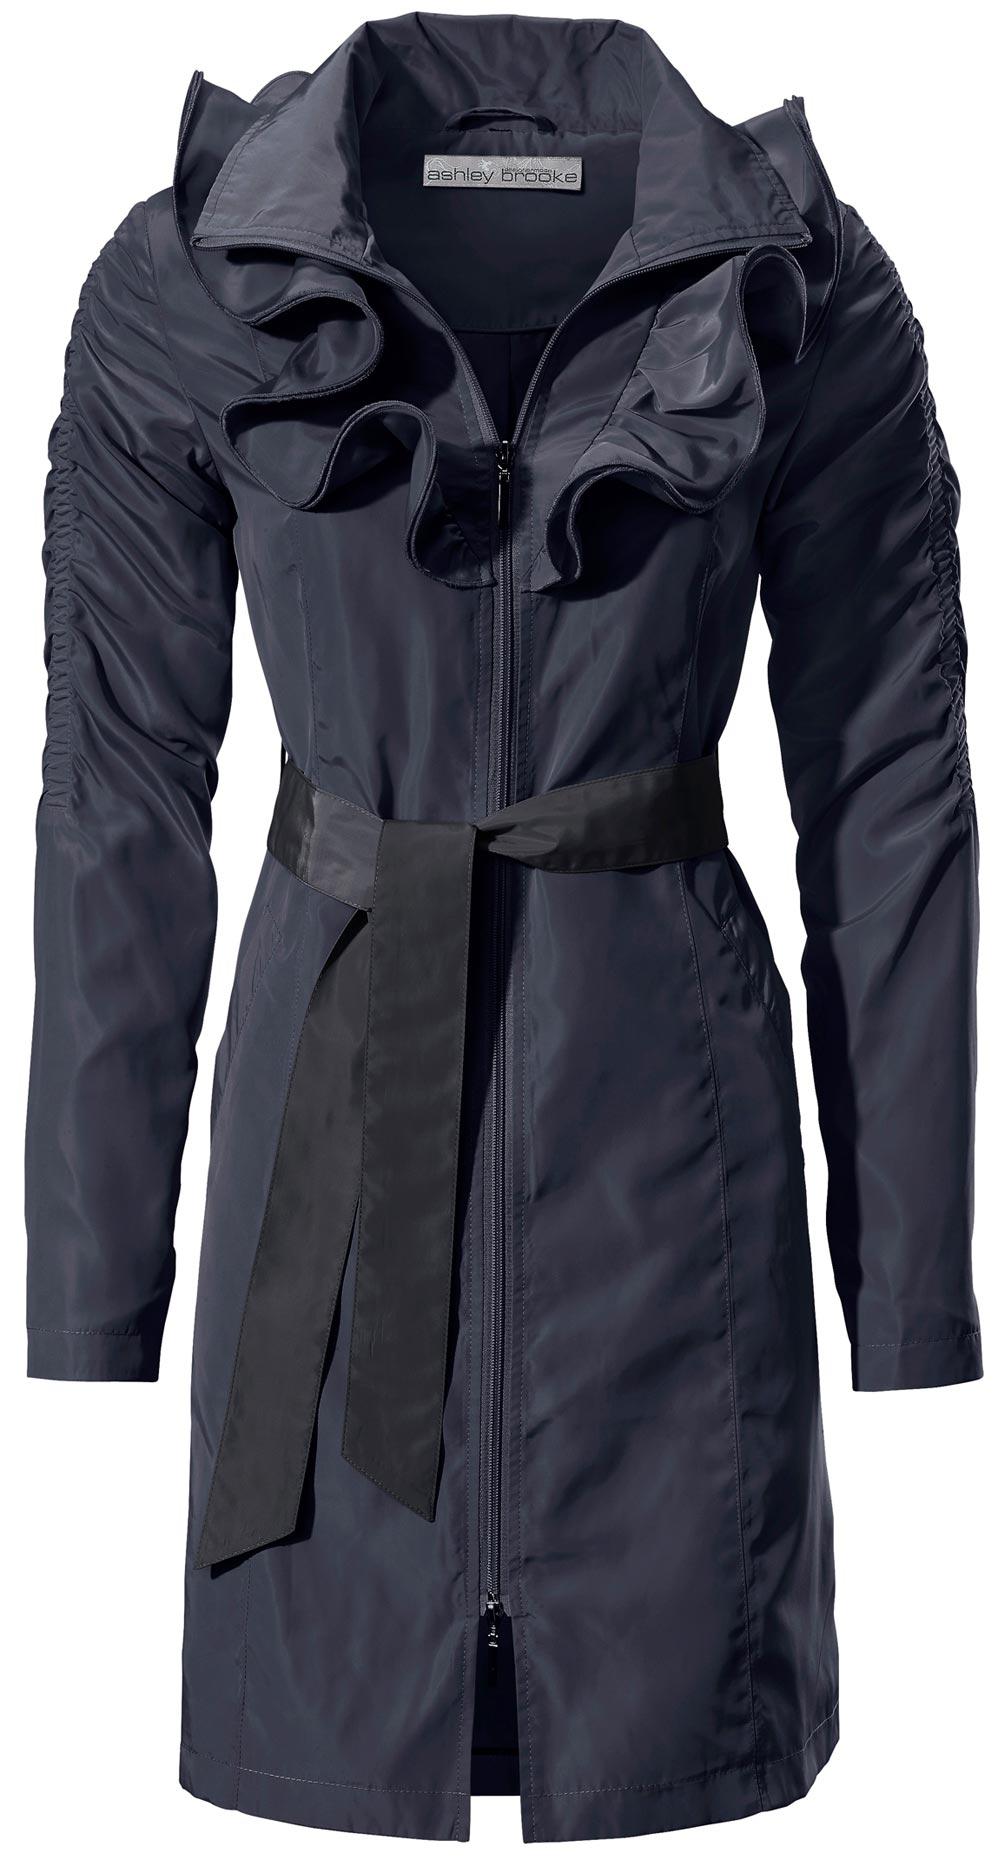 ashley brooke by heine -  Trenchcoat